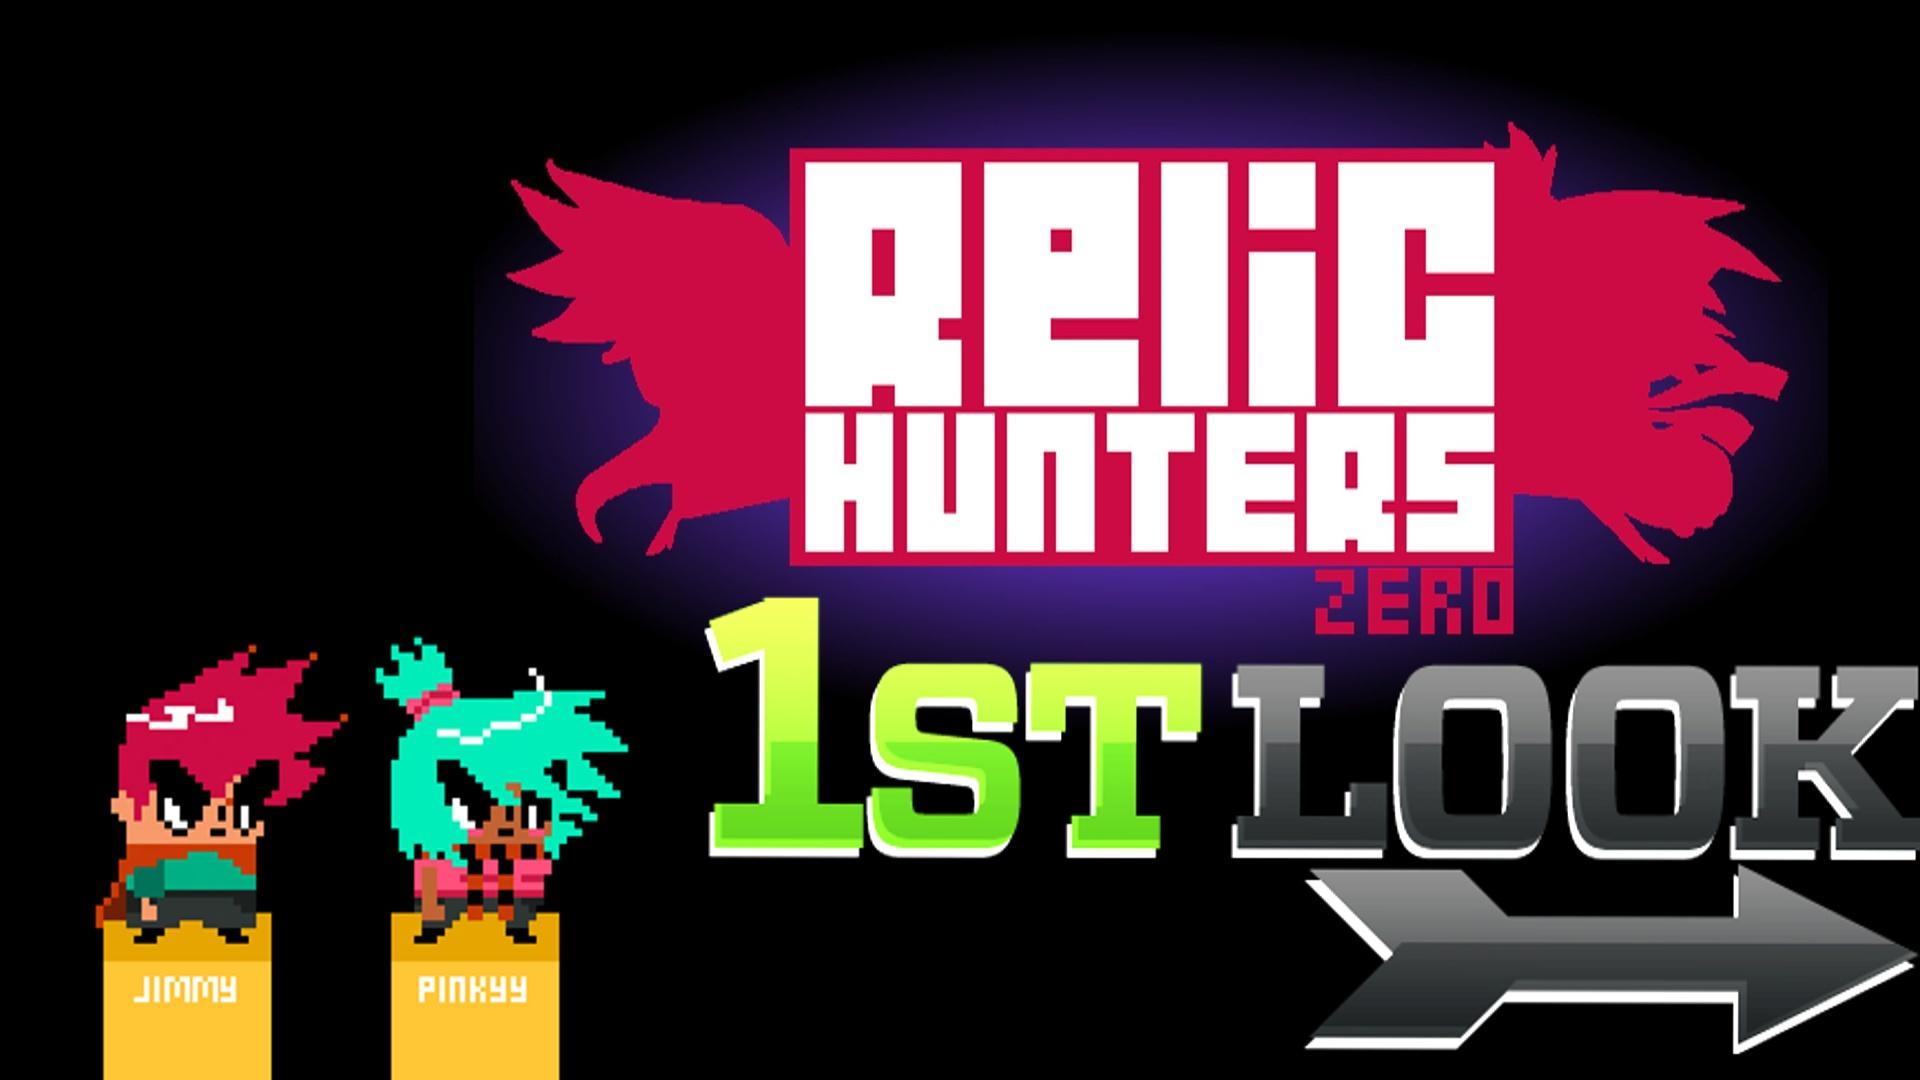 Relic Hunters Zero - First Look